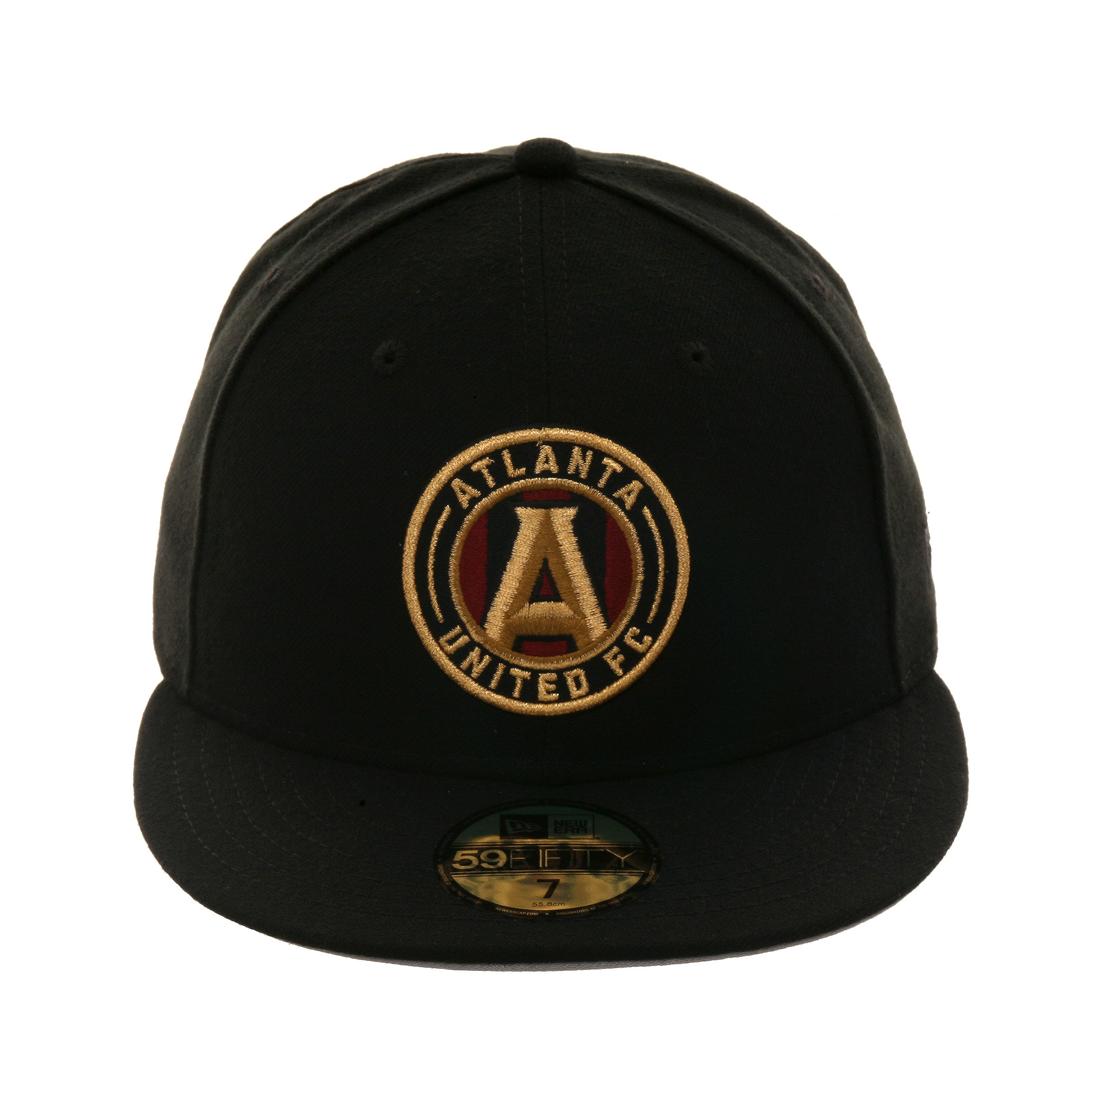 Exclusive New Era 59Fifty Atlanta United FC Hat - Black  d78526bbd